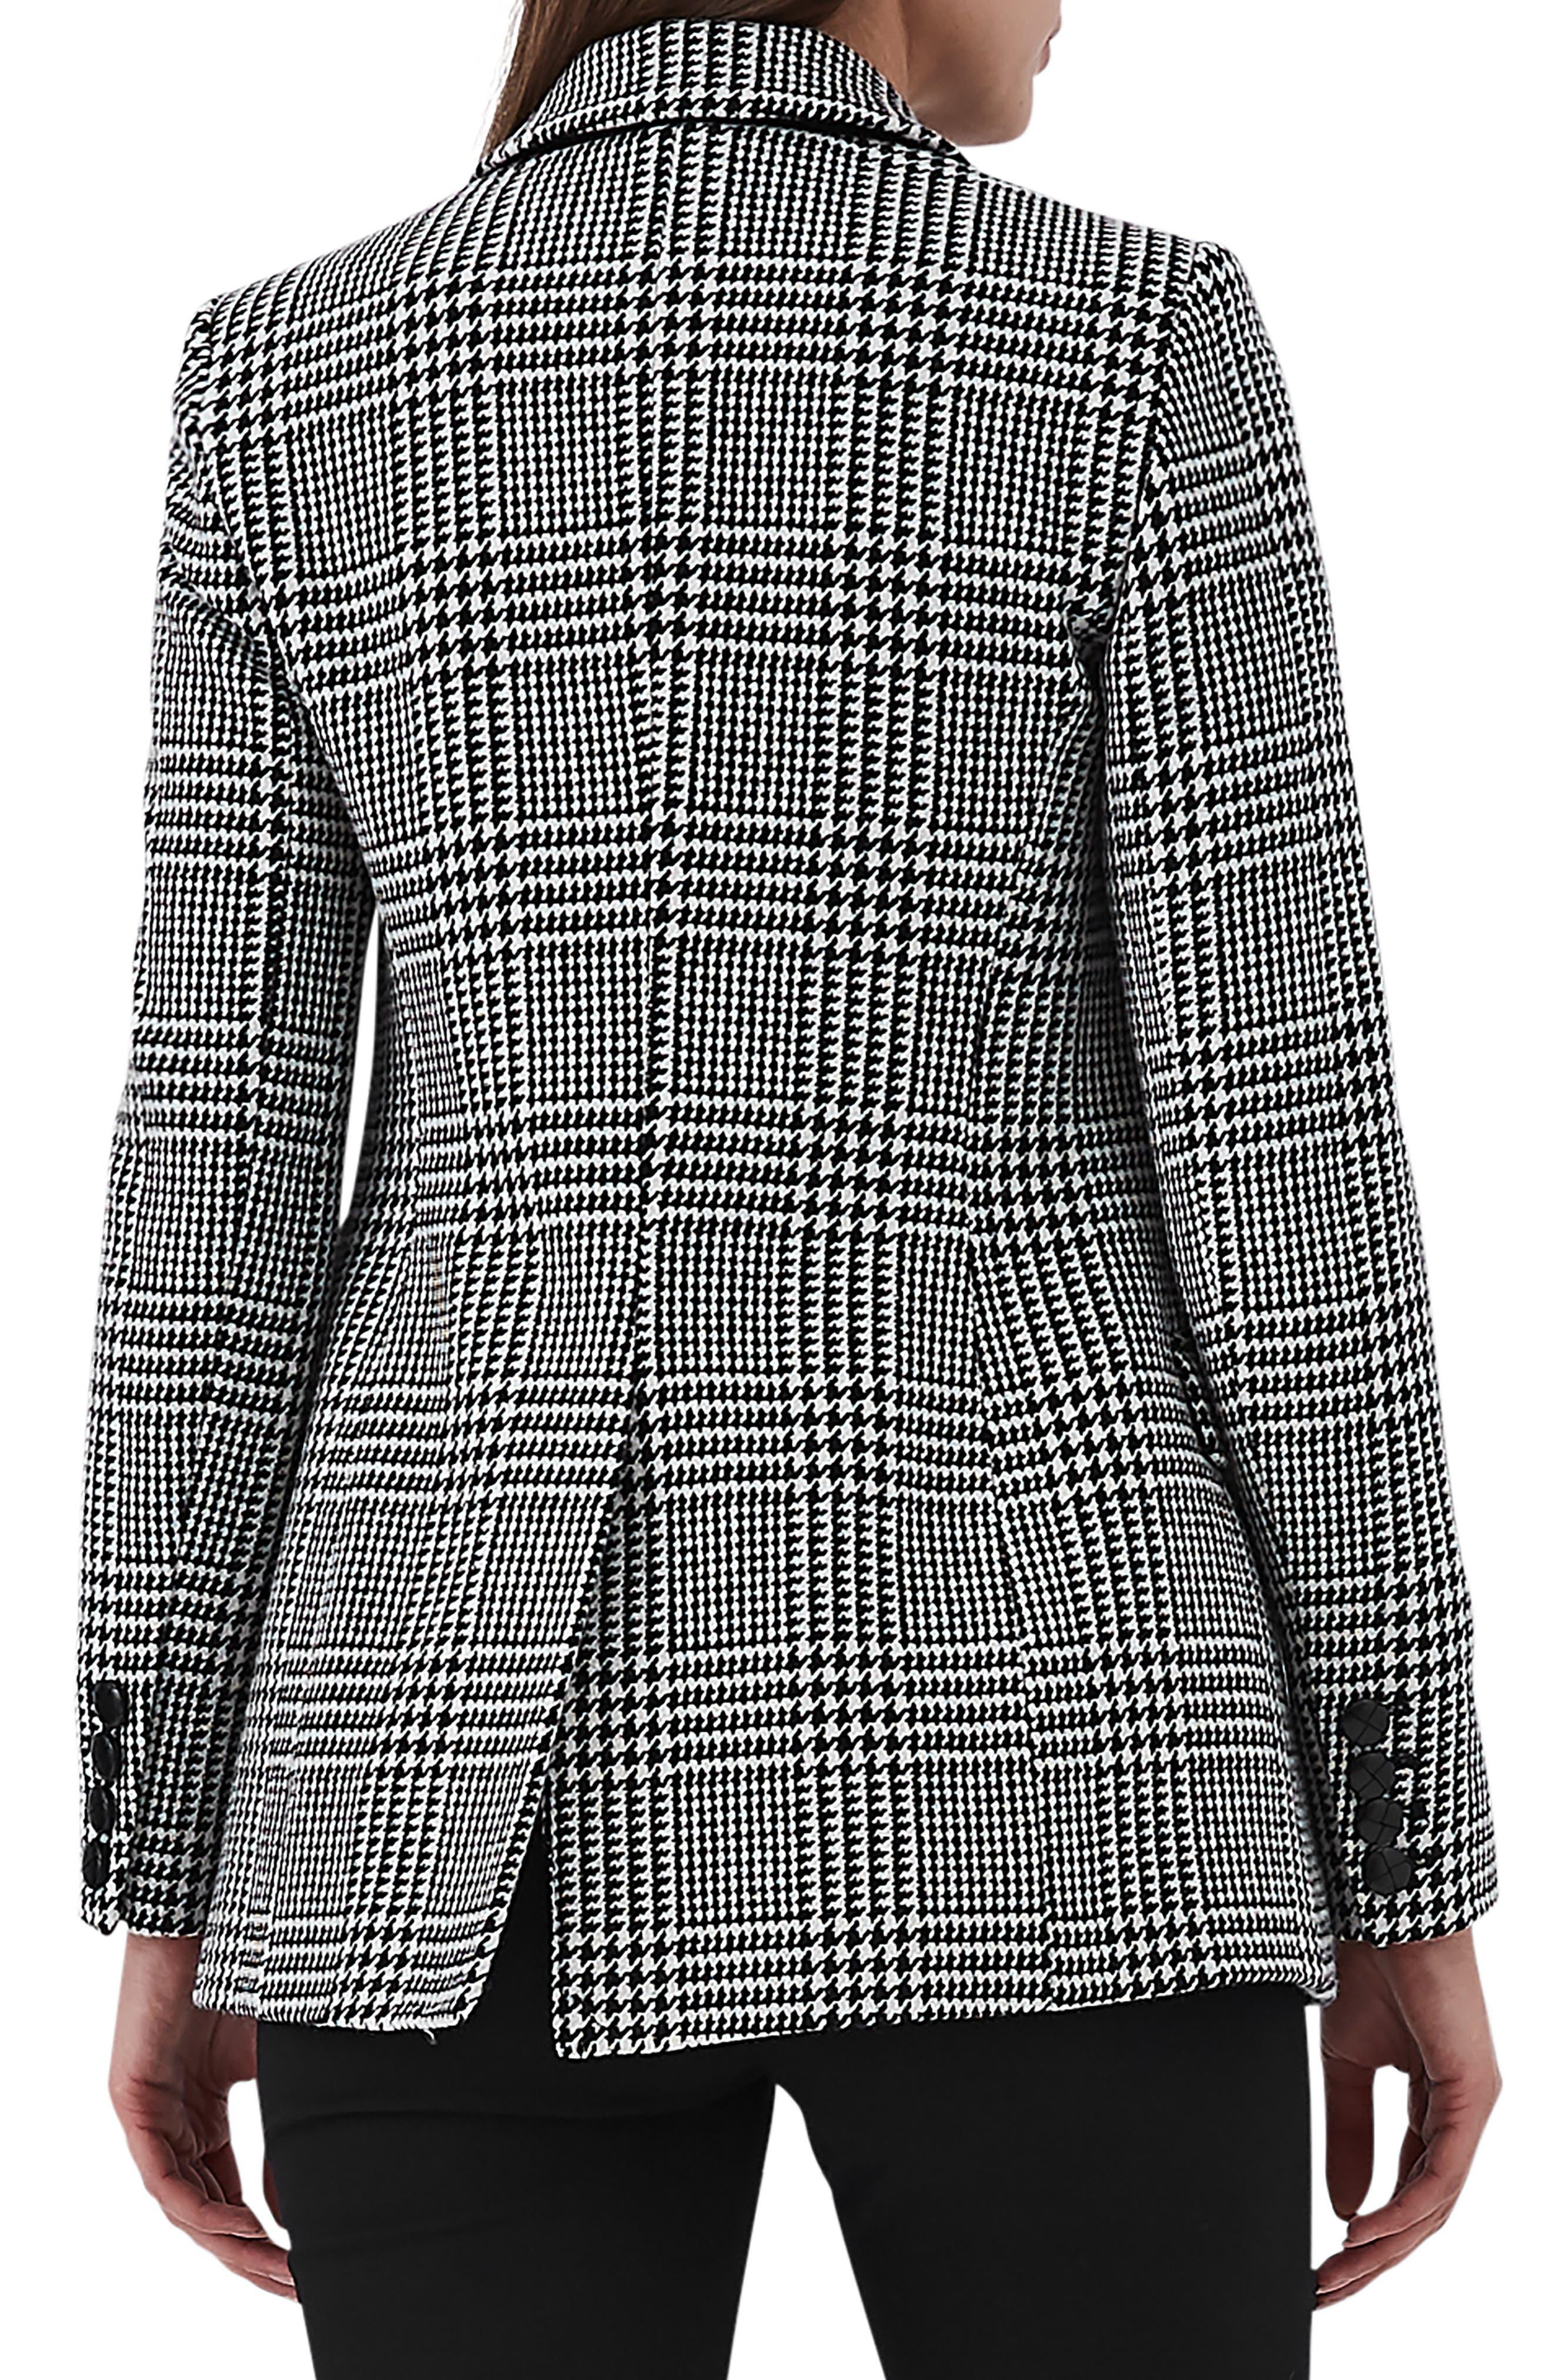 Langley Houndstooth Wool Blend Jacket,                             Alternate thumbnail 2, color,                             001